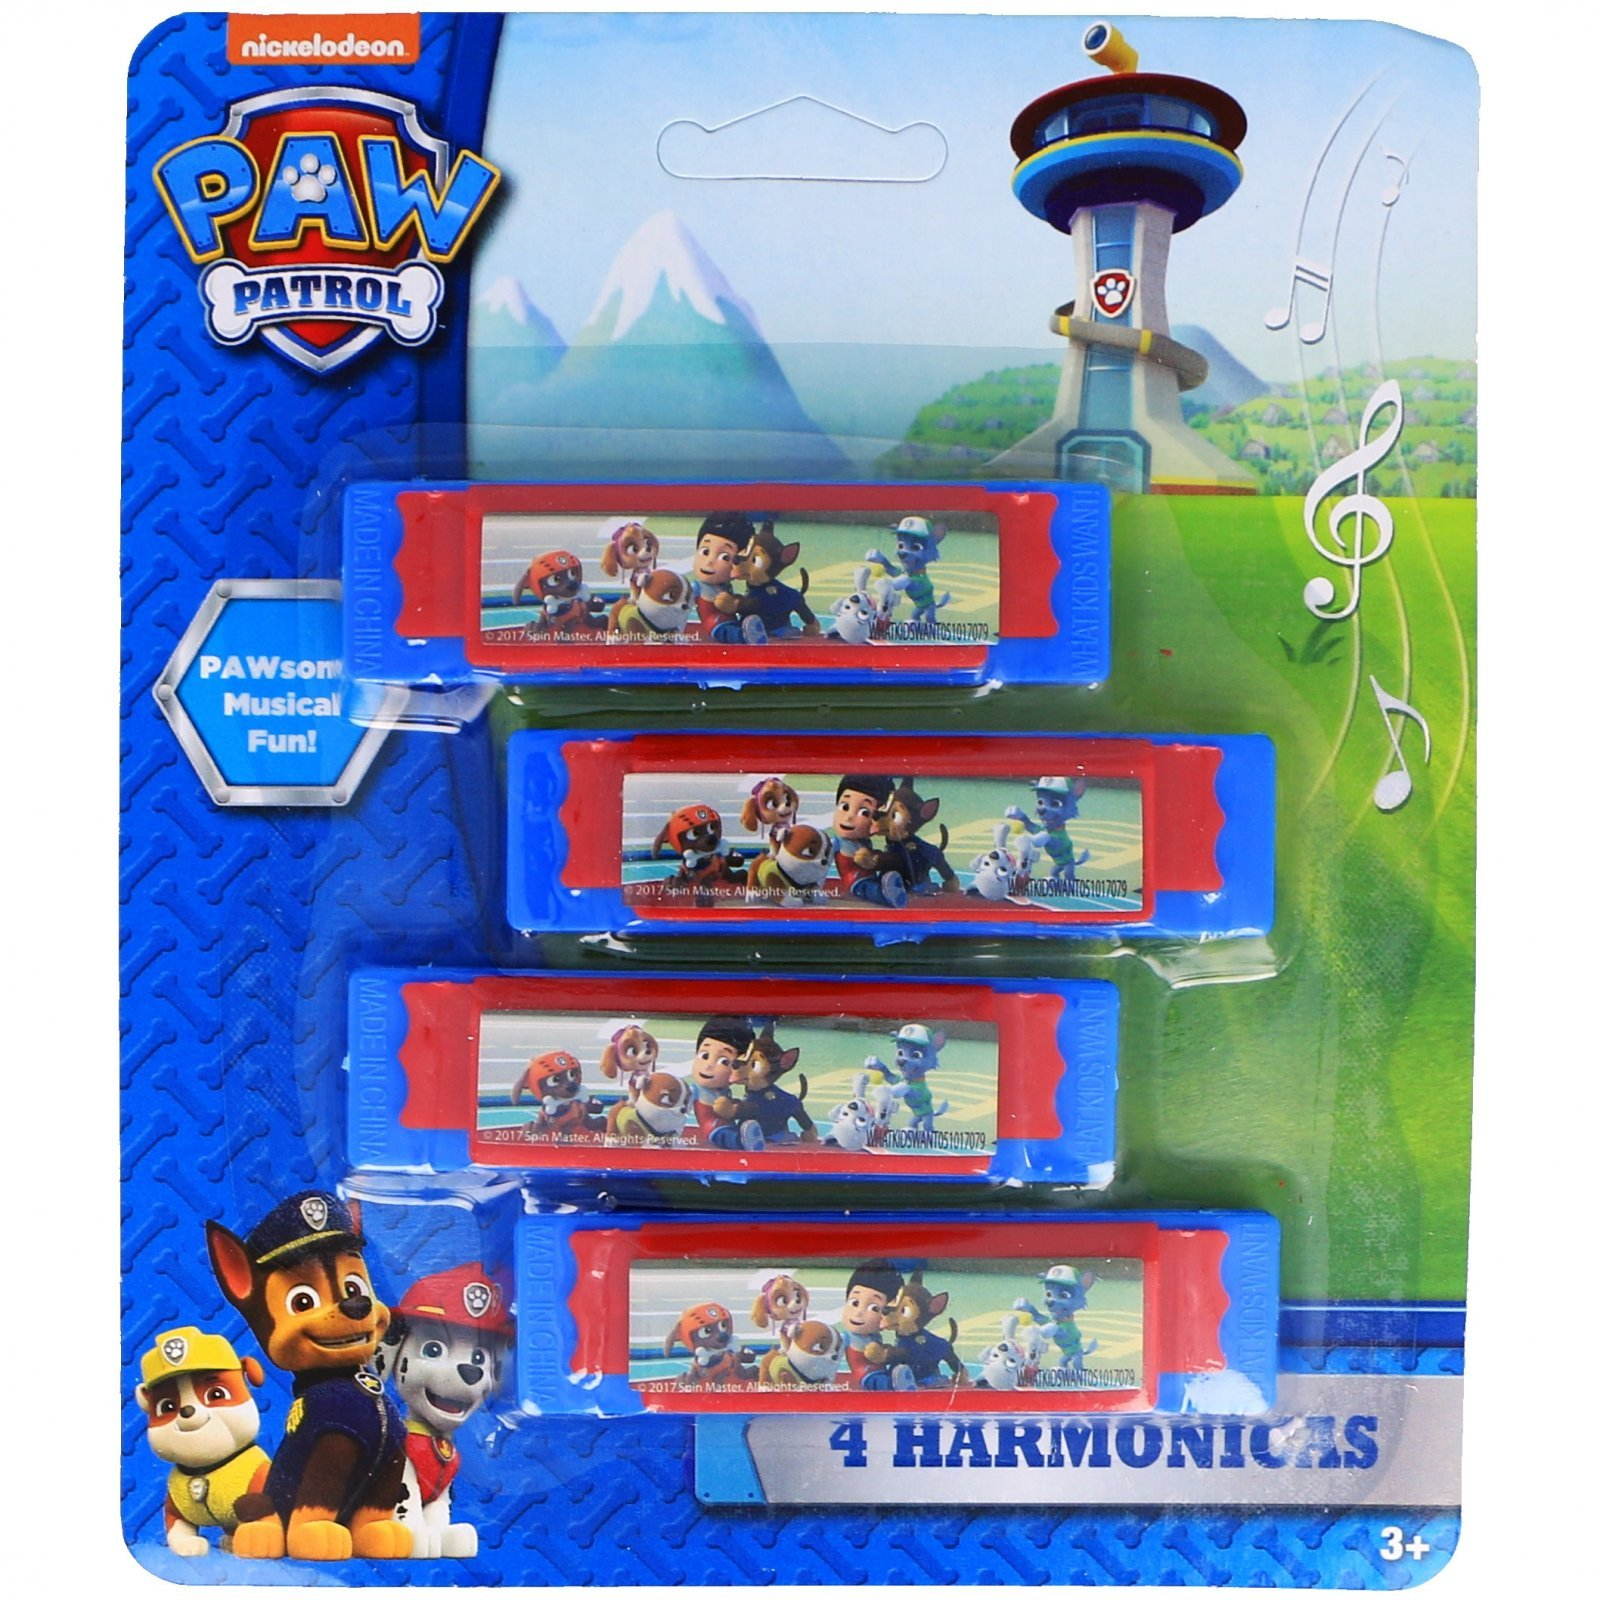 Nickelodeon Paw Patrol Boys Mini Harmonicas Kids Musical Instrument Toys - Blue